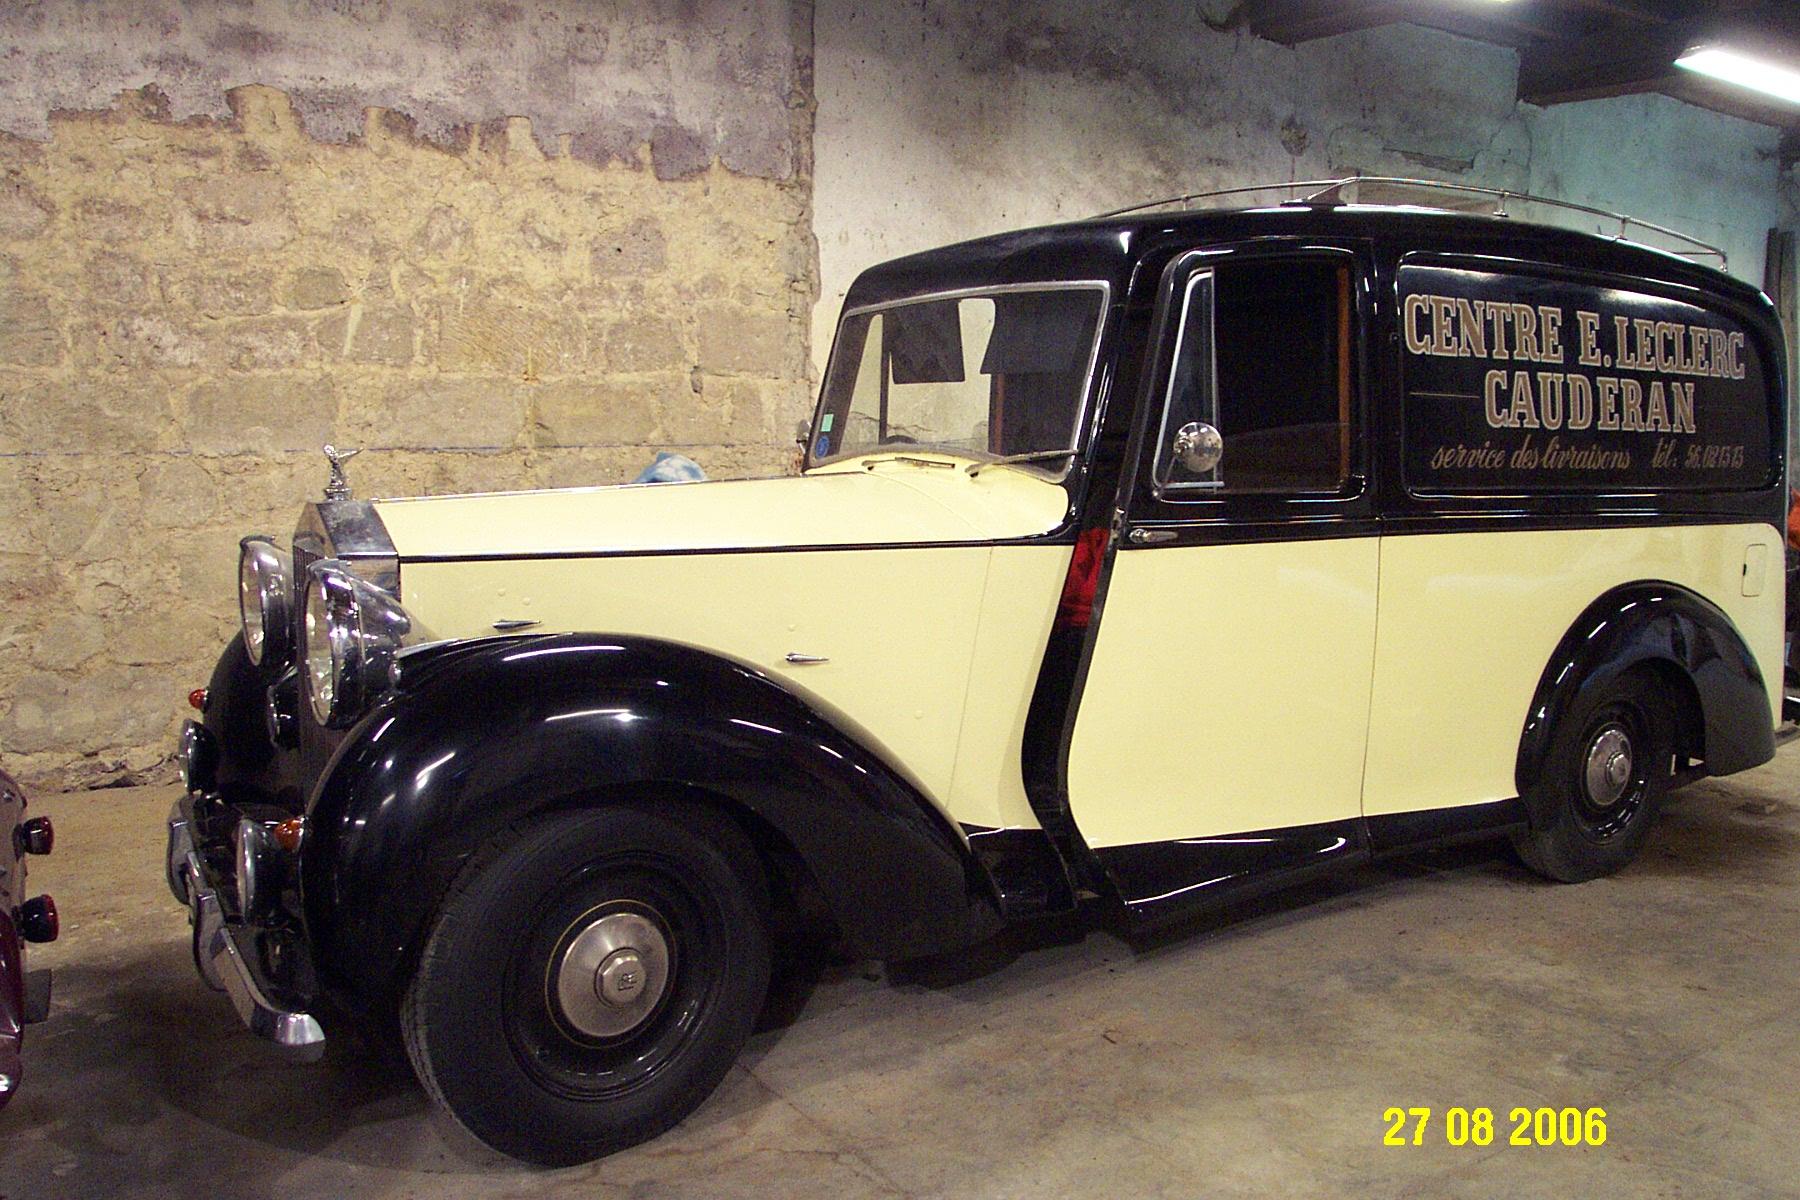 Rolls Royce. Ancien corbillard.